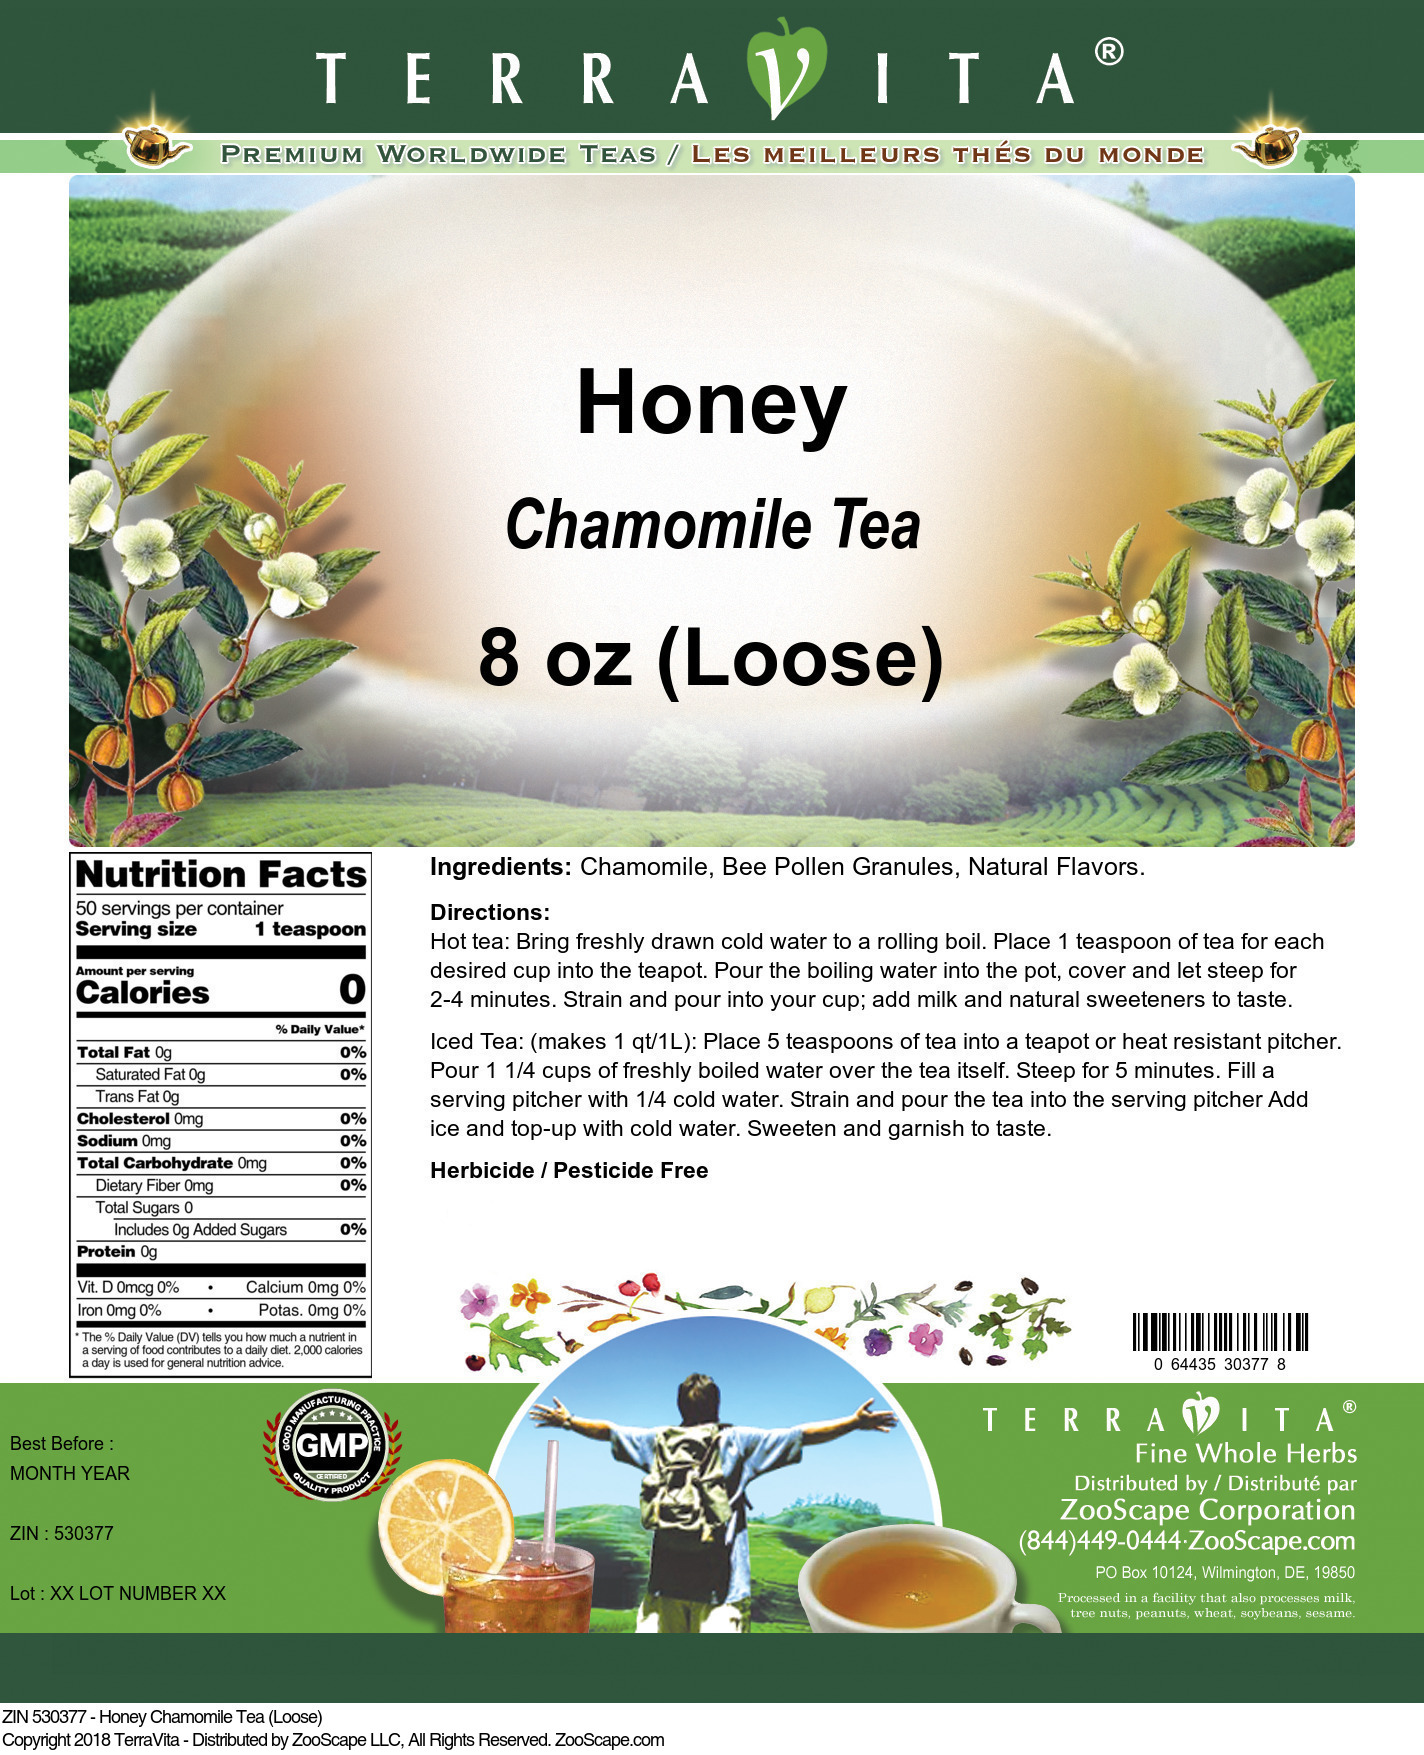 Honey Chamomile Tea